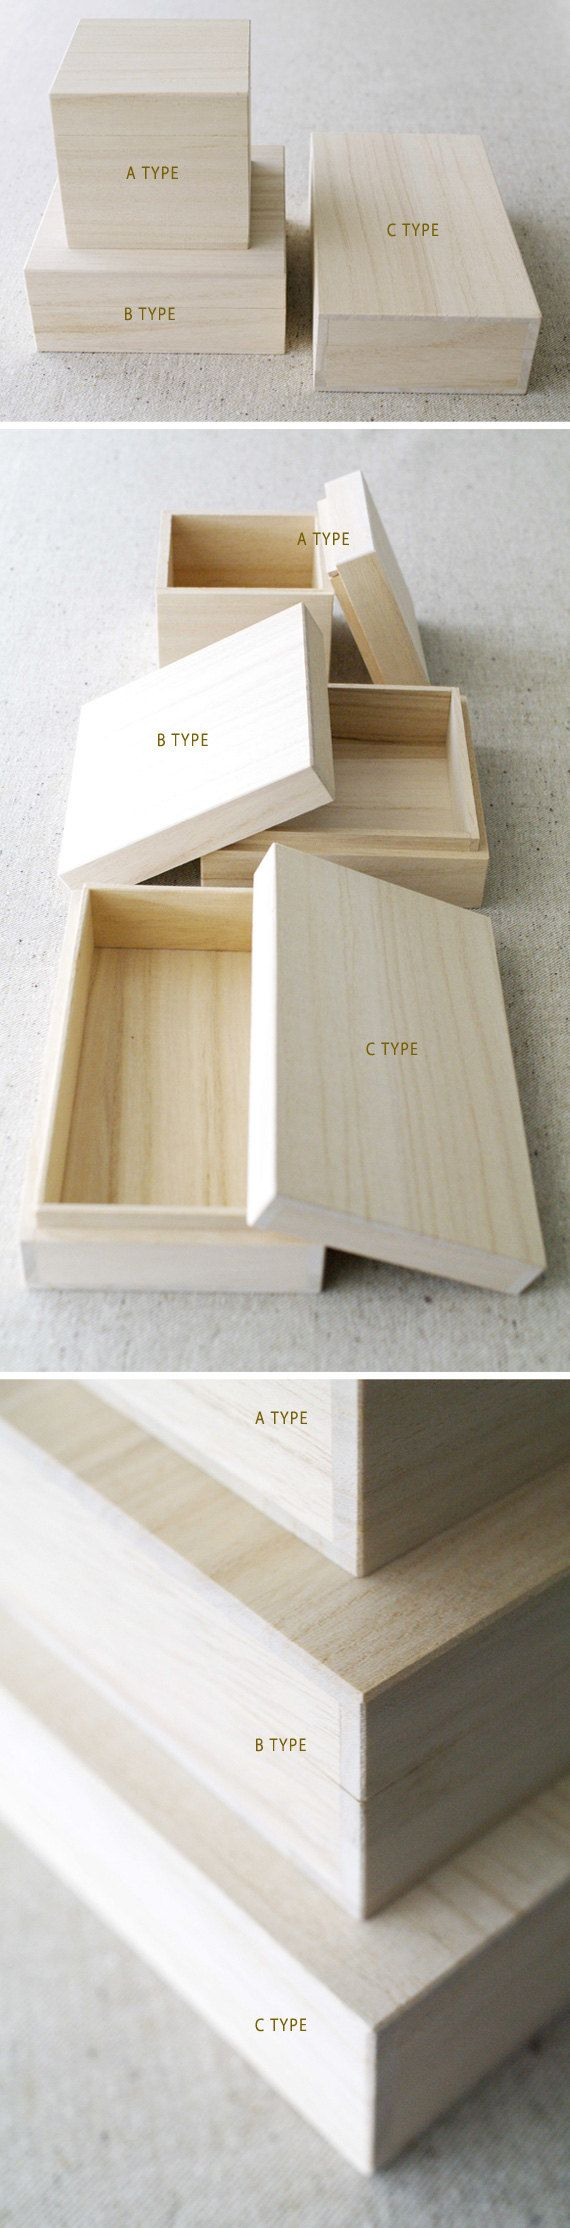 Wooden gift box JAPANESE STYLE B TYPE by karaku on Etsy